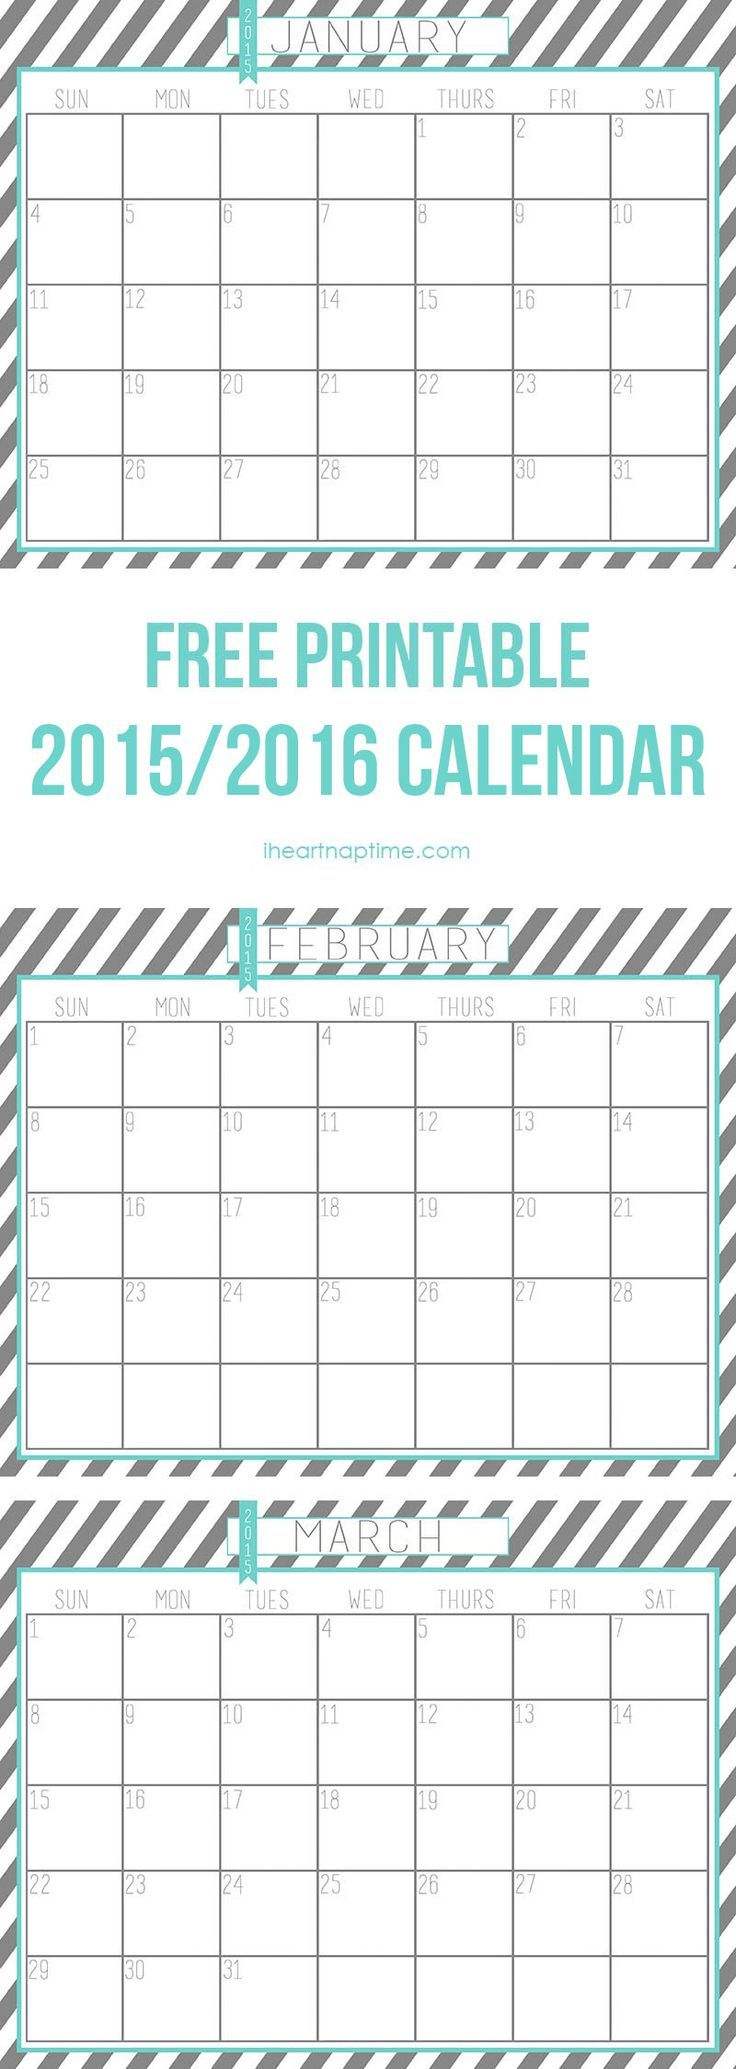 2015 - 2016 free printable calendar on iheartnaptime.com